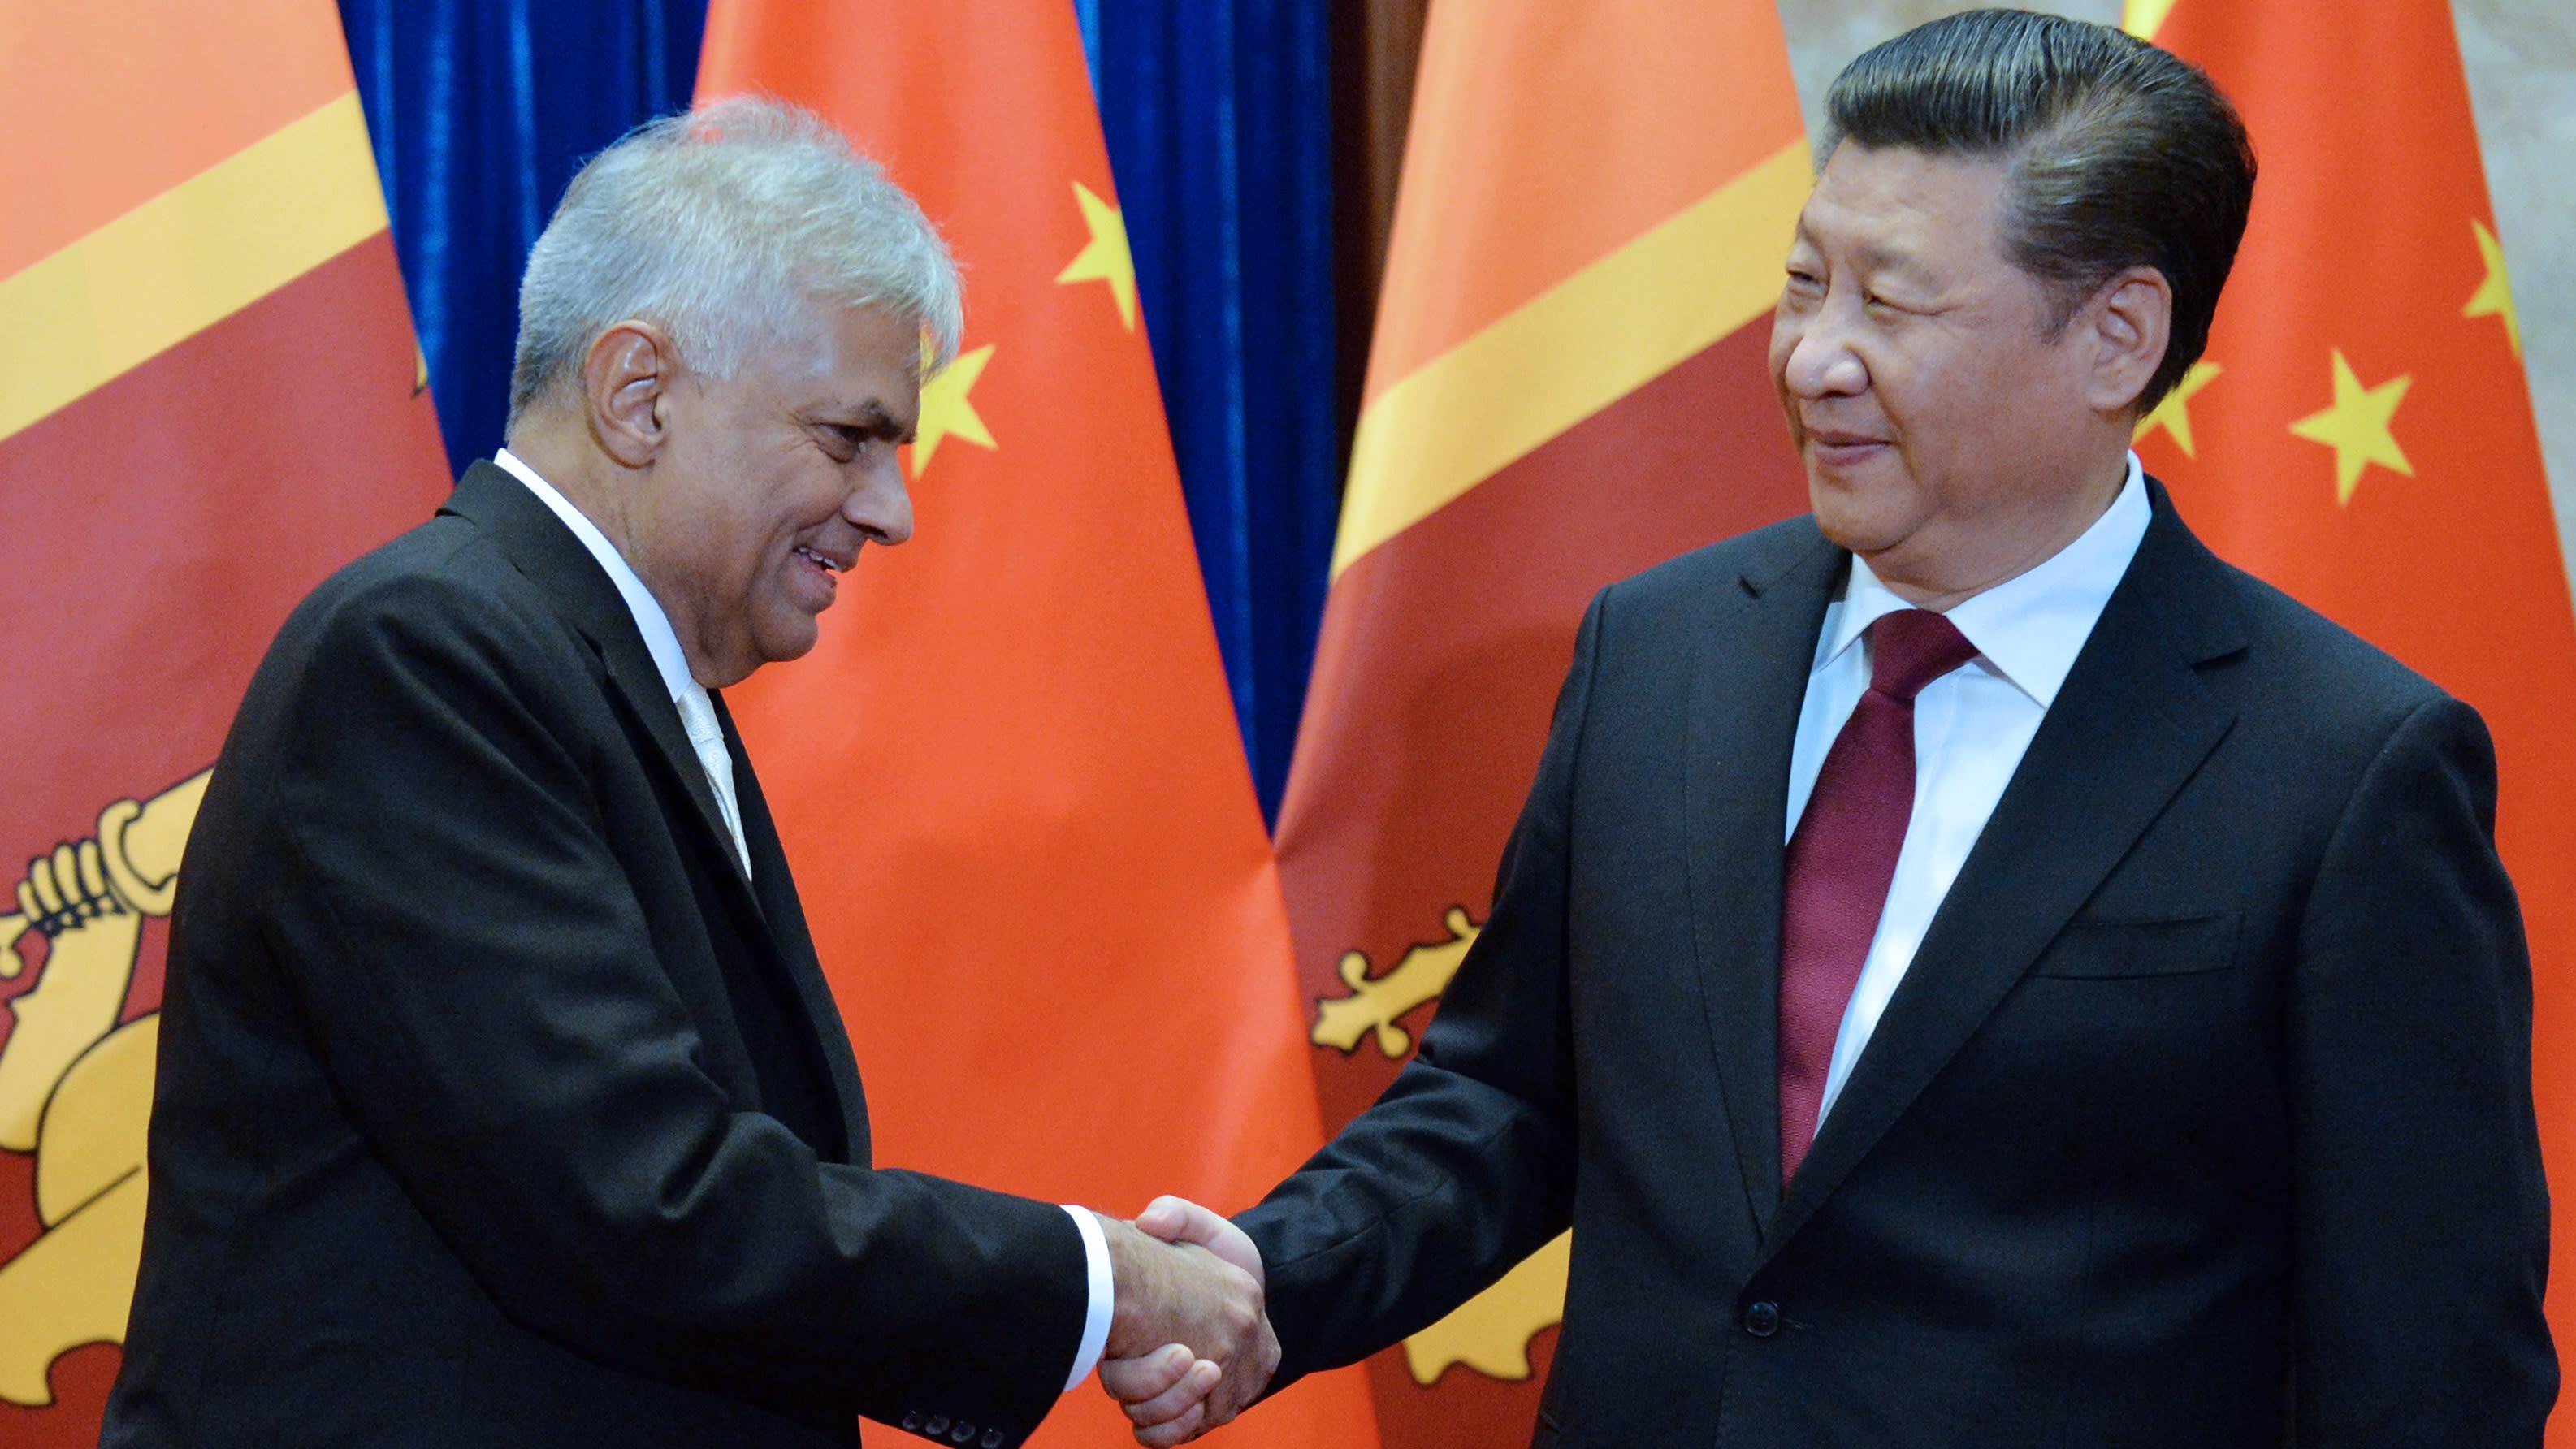 Sri lanka sinks deeper into chinas grasp as debt woes spiral sri lanka sinks deeper into chinas grasp as debt woes spiral m4hsunfo